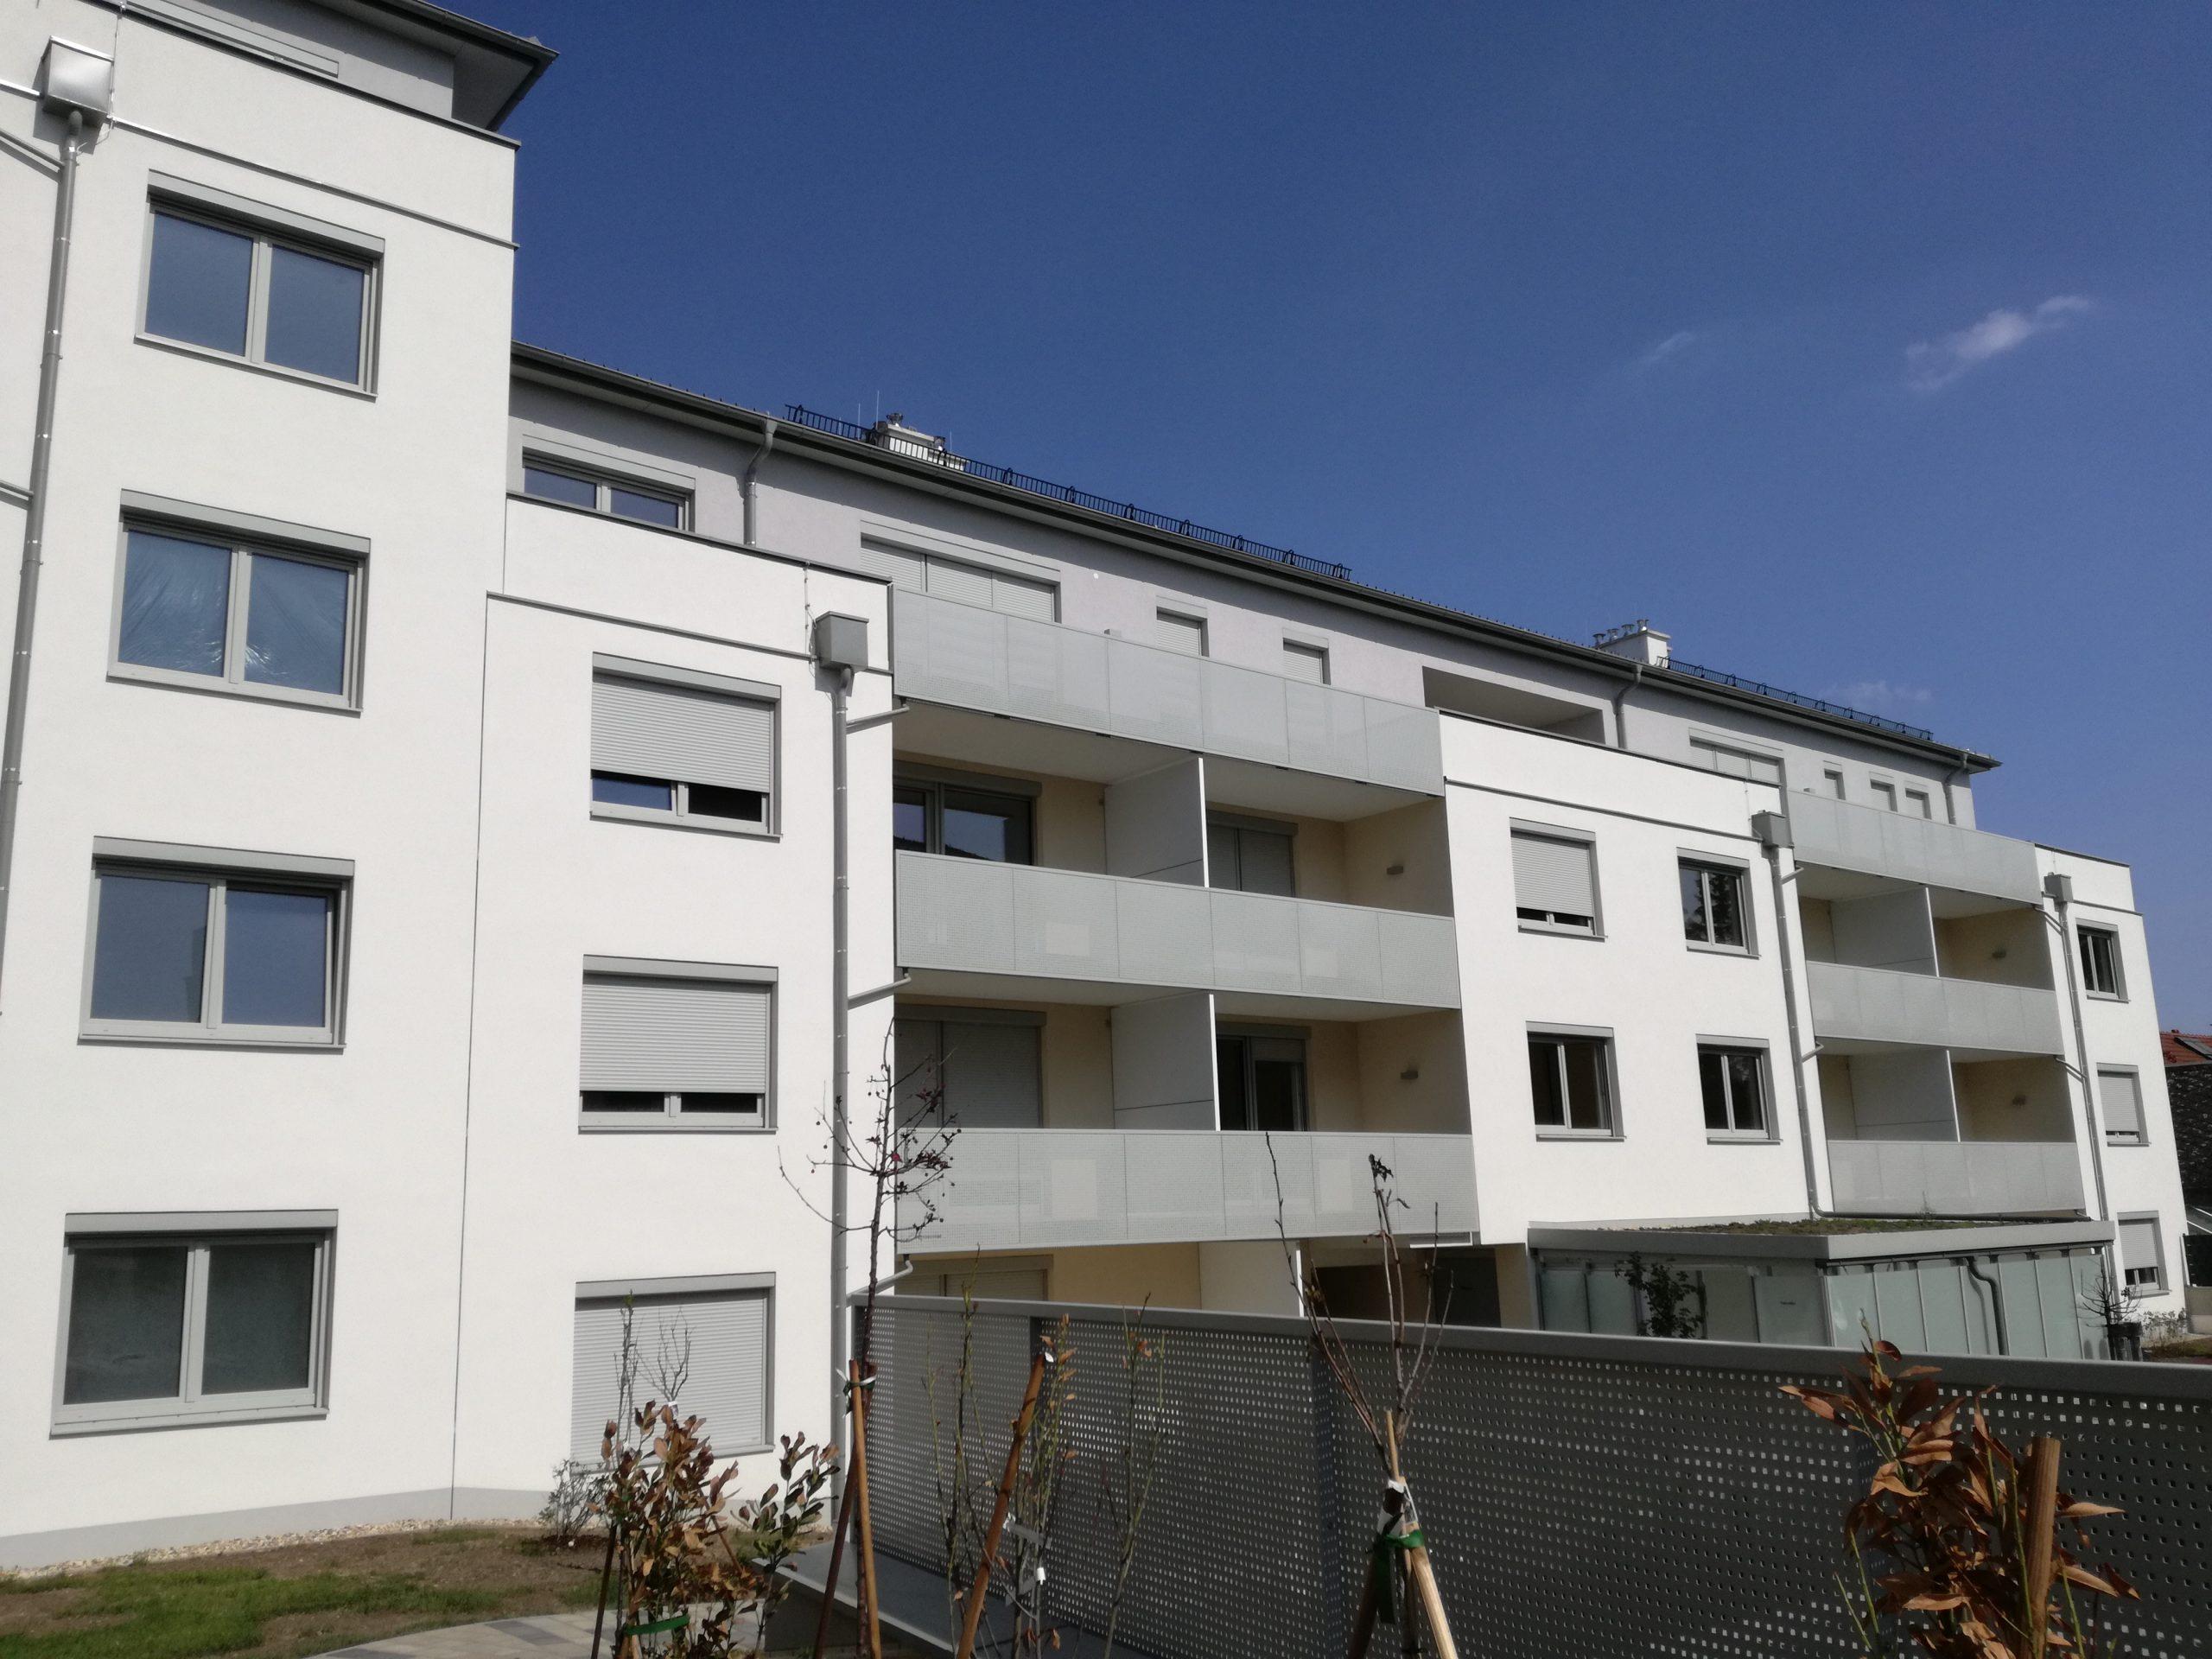 Immobilie von Kamptal in 2130 Mistelbach, Mistelbach, Mistelbach X/1 & X/2 - Top 205 #4